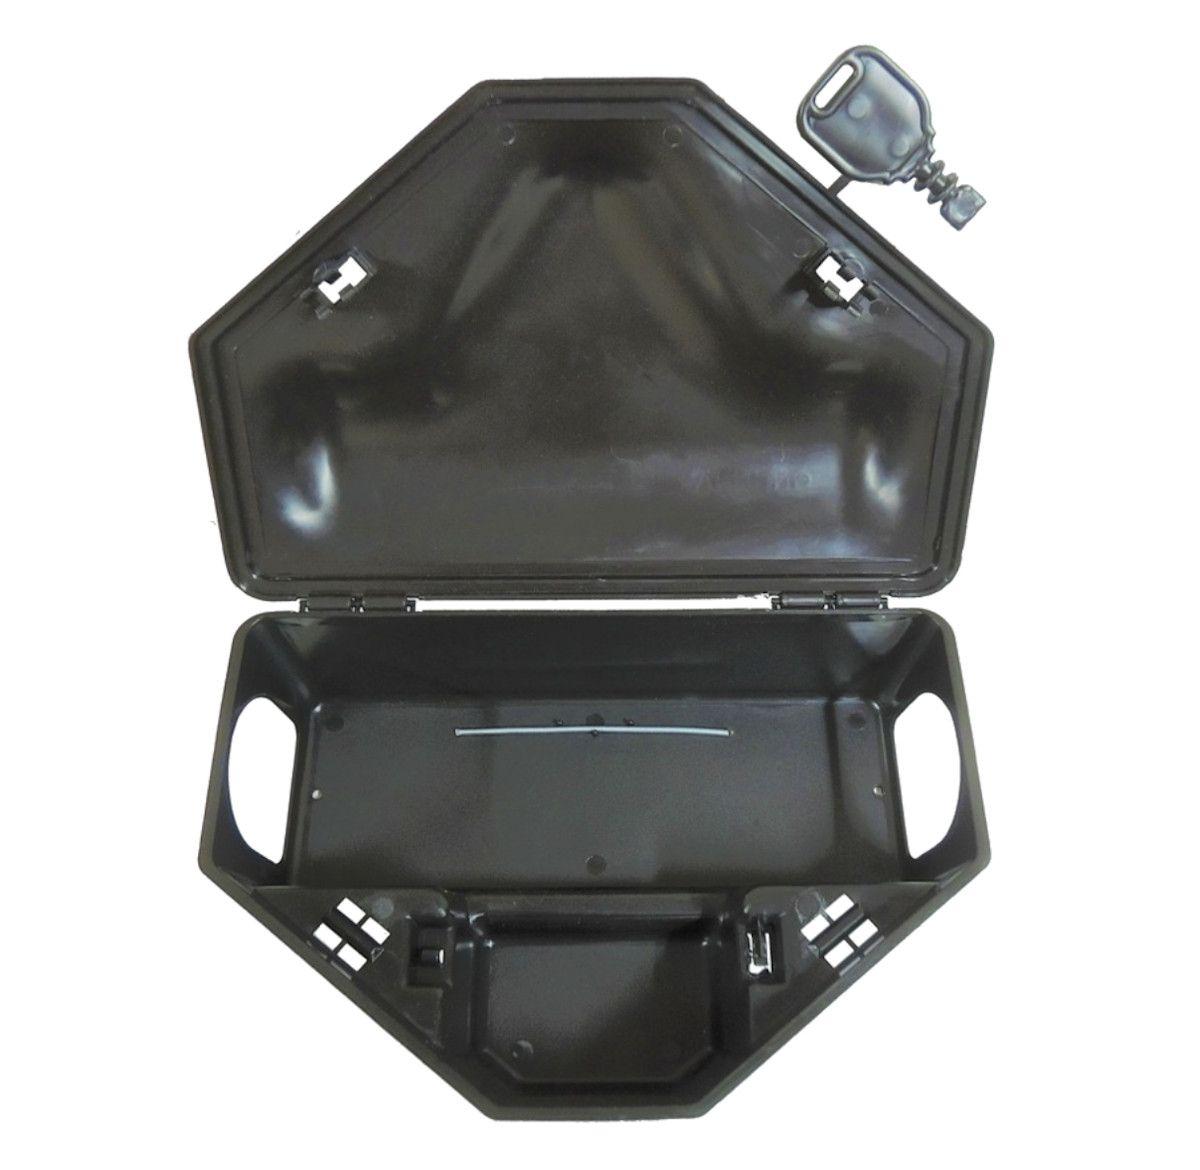 Kit 44 Porta Isca Com 2 Chaves - Duplo Travamento